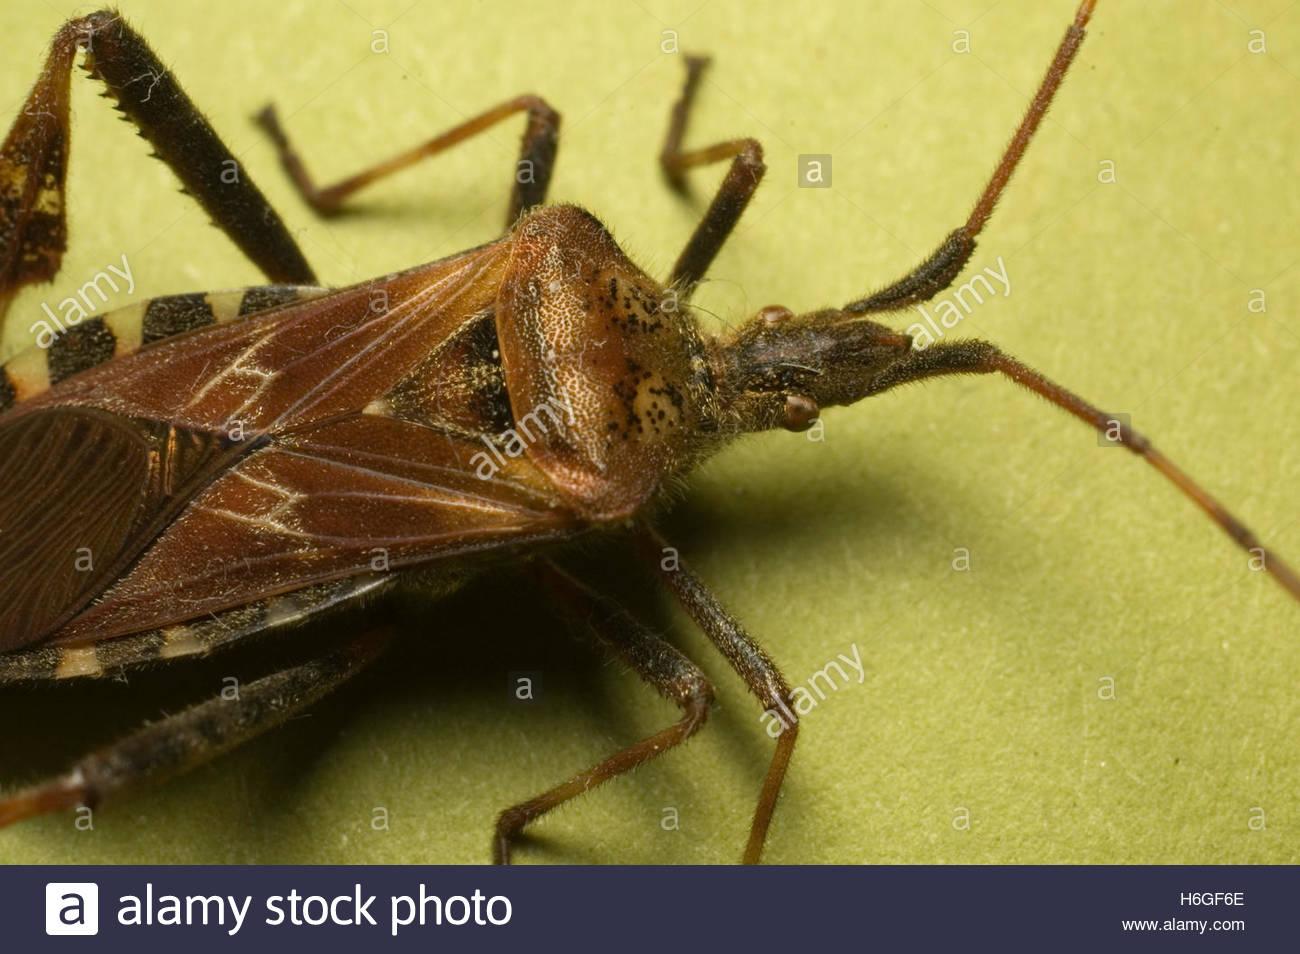 Western Conifer Seed Bug Leptoglossus occidentalis Leaf Footed Bug ...